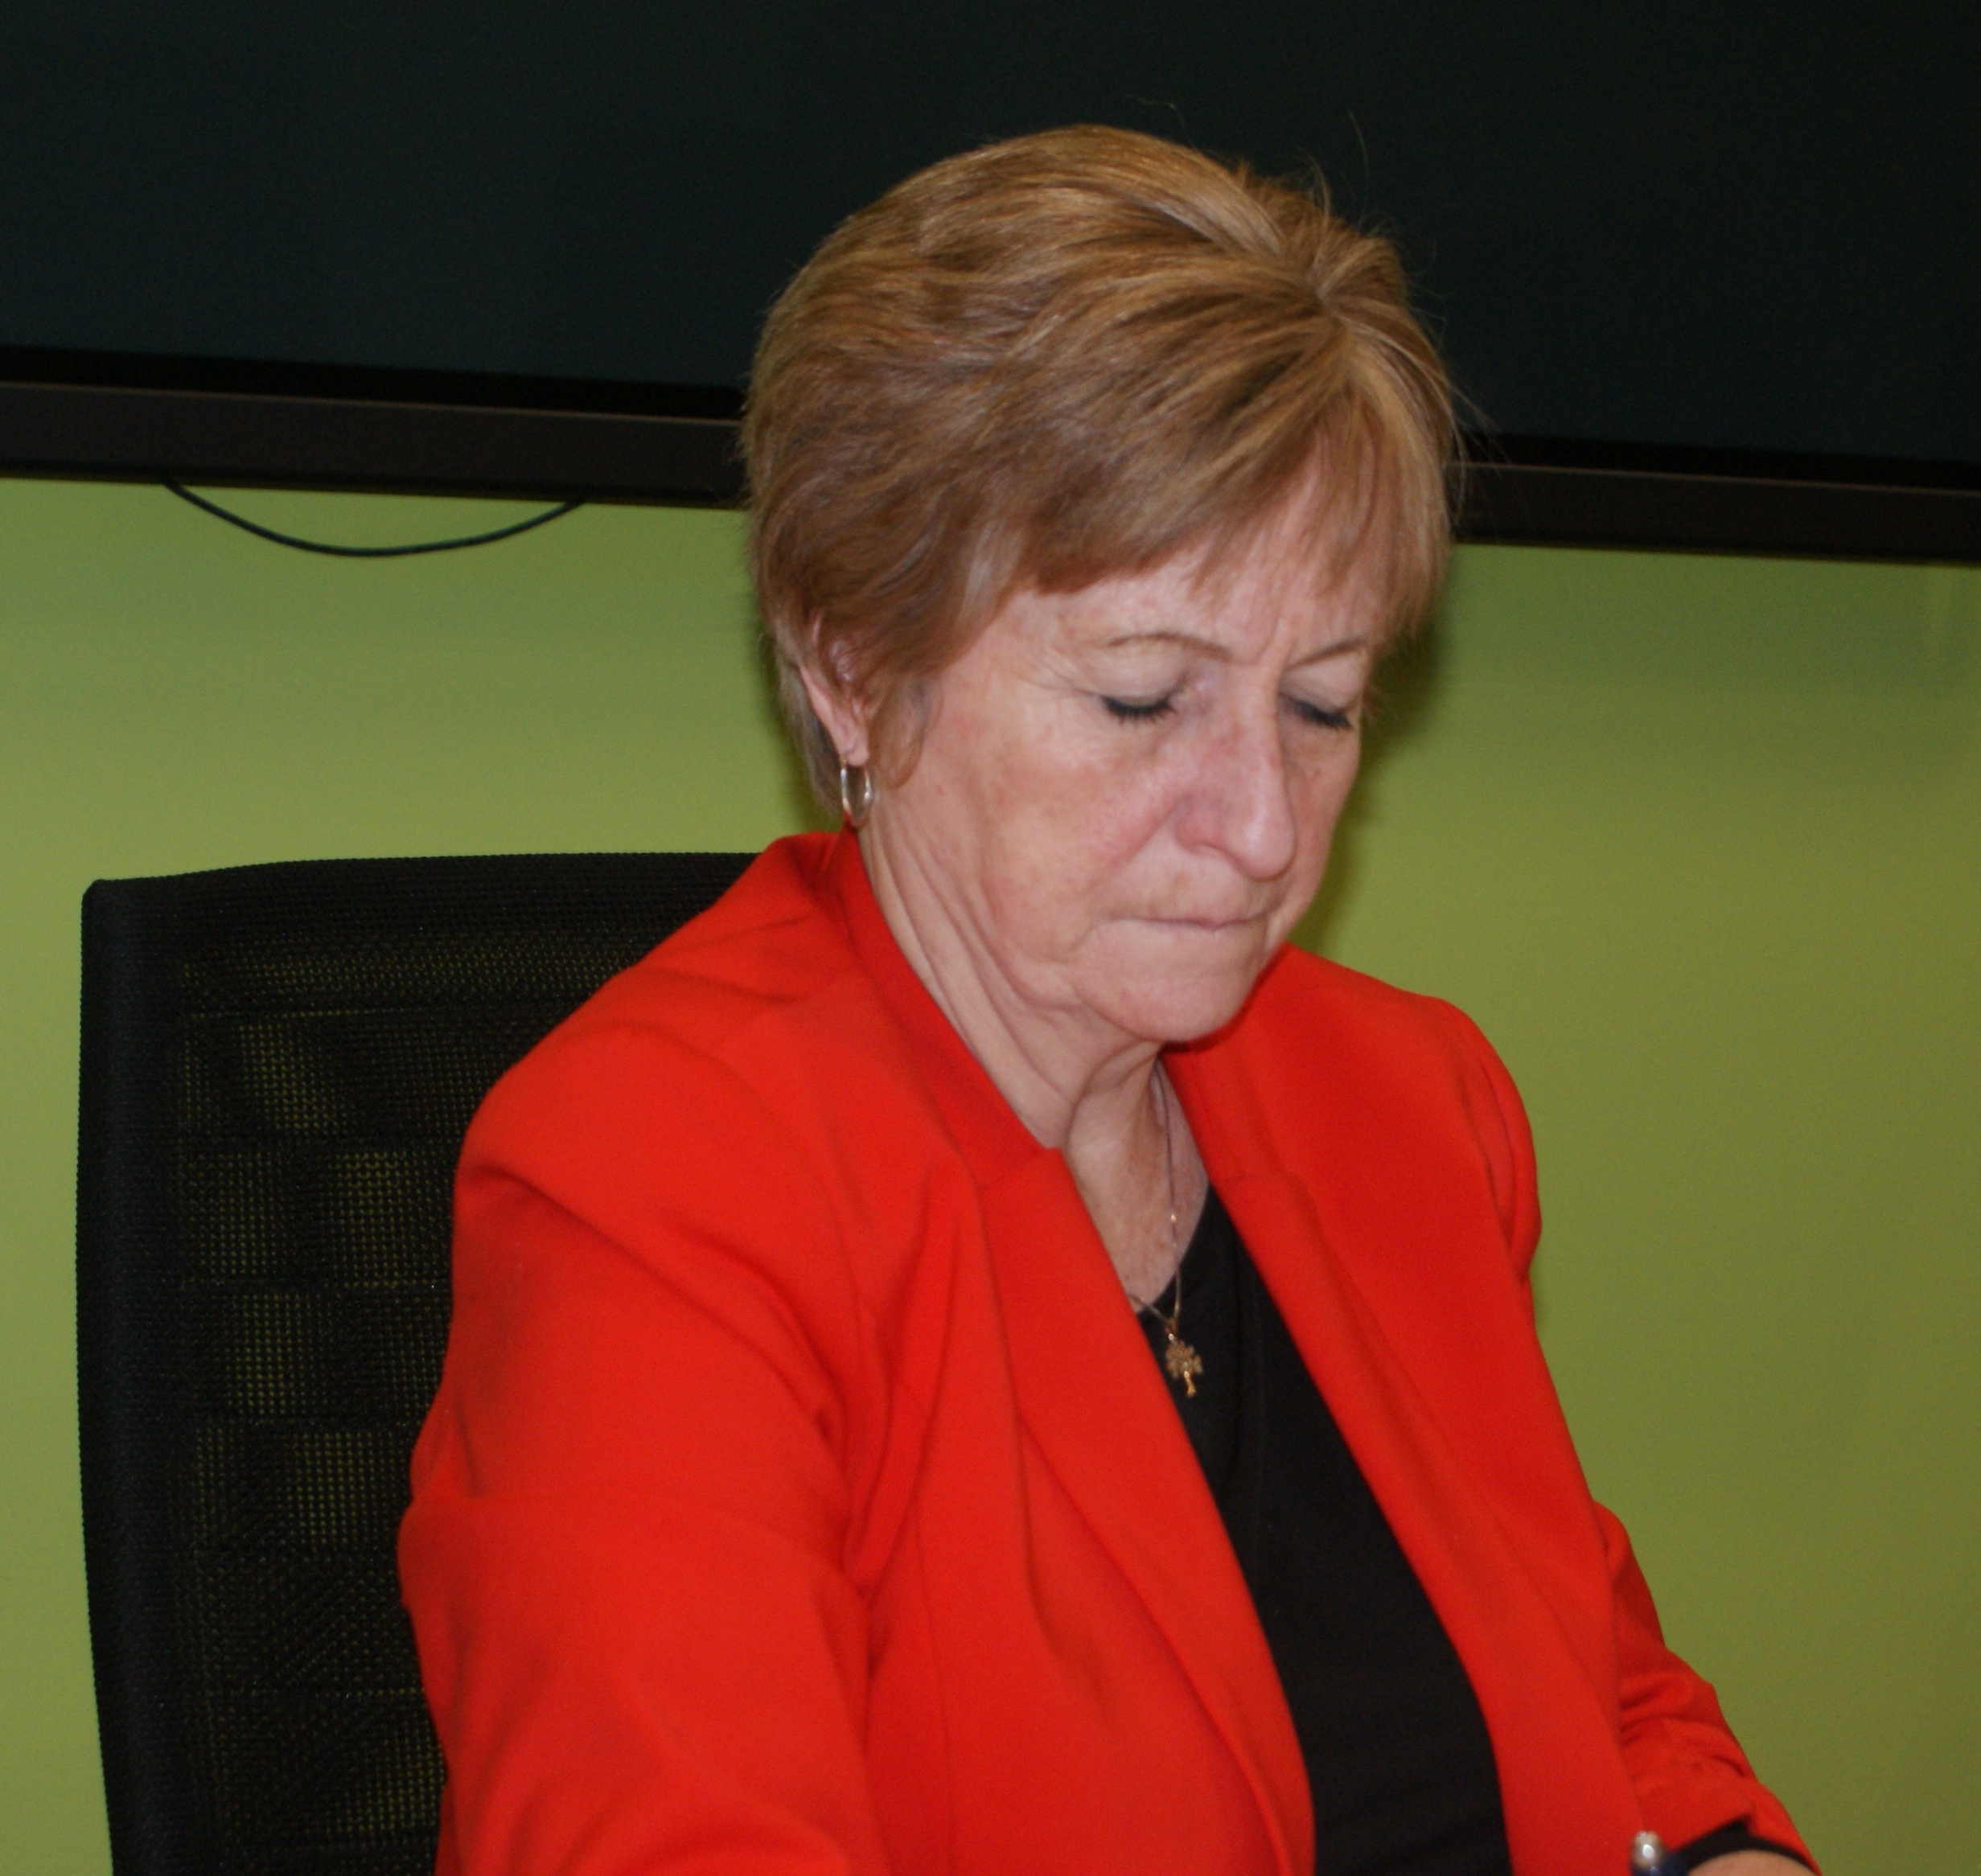 Madeline McCarthy